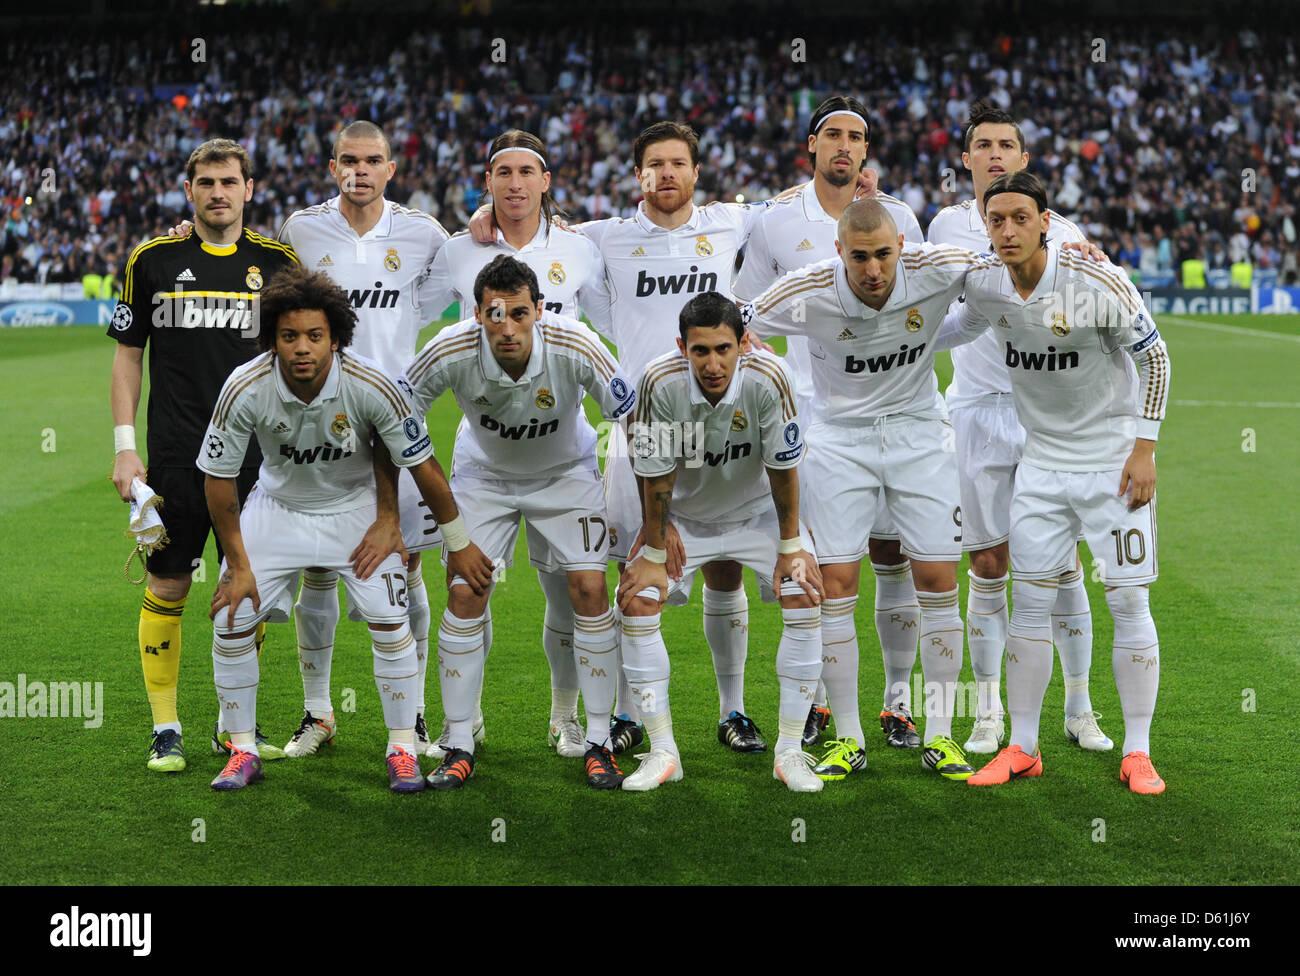 lequipe-de-madrid-retour-l-r-iker-casillas-pepe-sergio-ramos-xabi-alonso-sami-khedira-cristiano-ronaldo-avant-l-r-marcelo-alvaro-arbeloa-angel-di-maria-benzema-et-mesut-oezil-posent-avant-la-demi-finale-de-la-ligue-des-champions-de-football-match-match-retour-entre-le-real-madrid-et-le-fc-bayern-munich-au-santiago-bernabeu-a-madrid-espagne-25-avril-2012-photo-marc-muelle-d61j6y.jpg